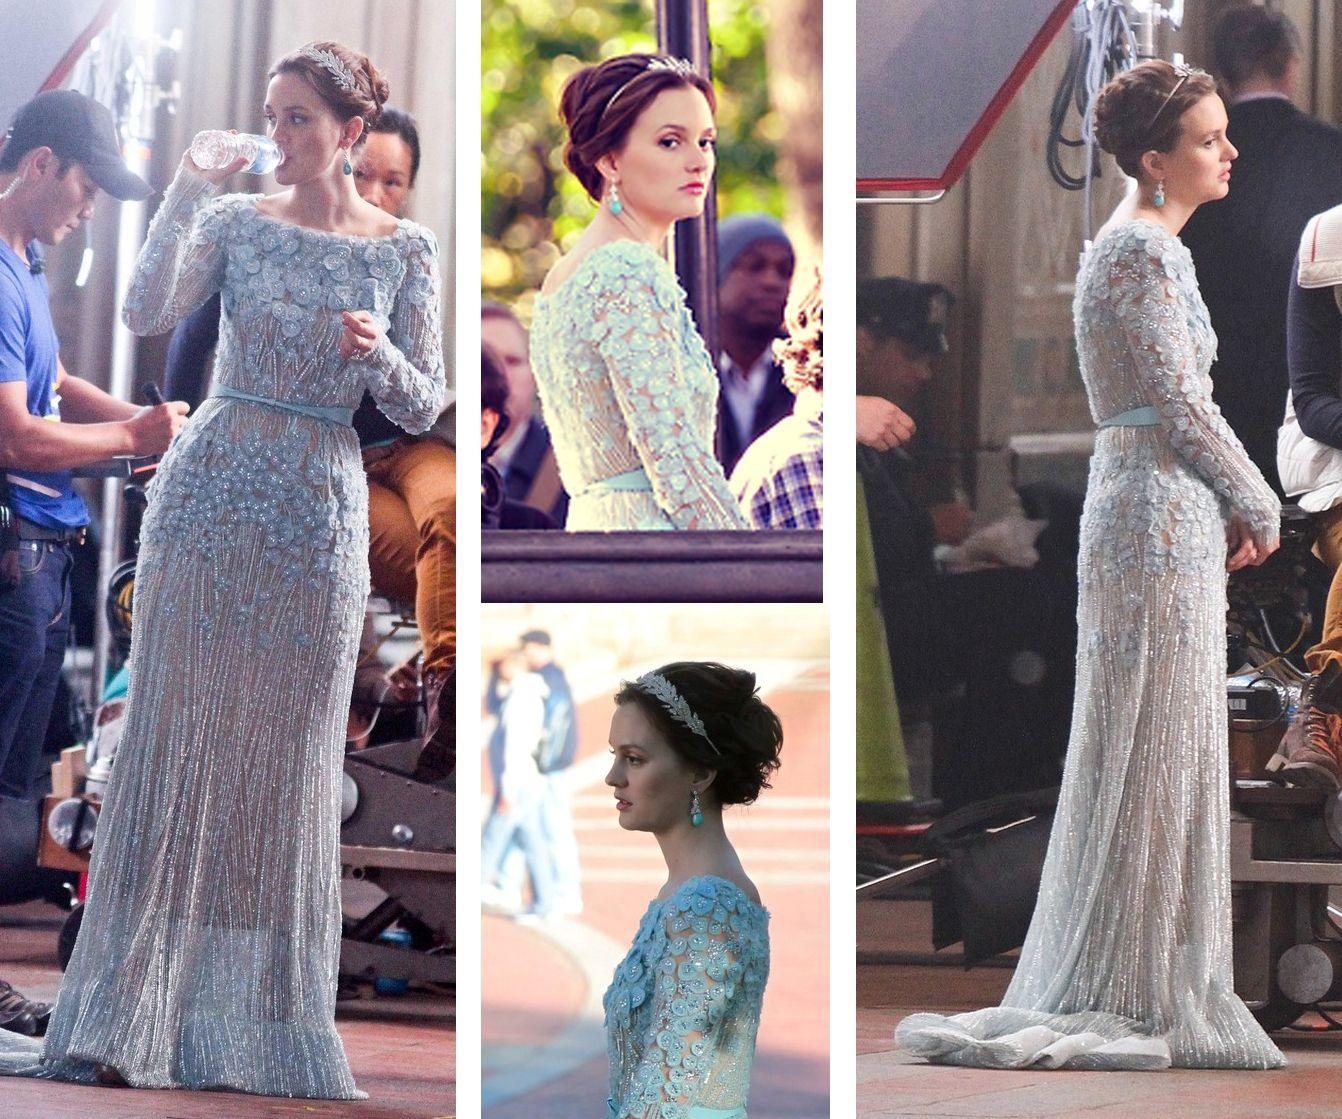 Leighton Meester Wedding Dress